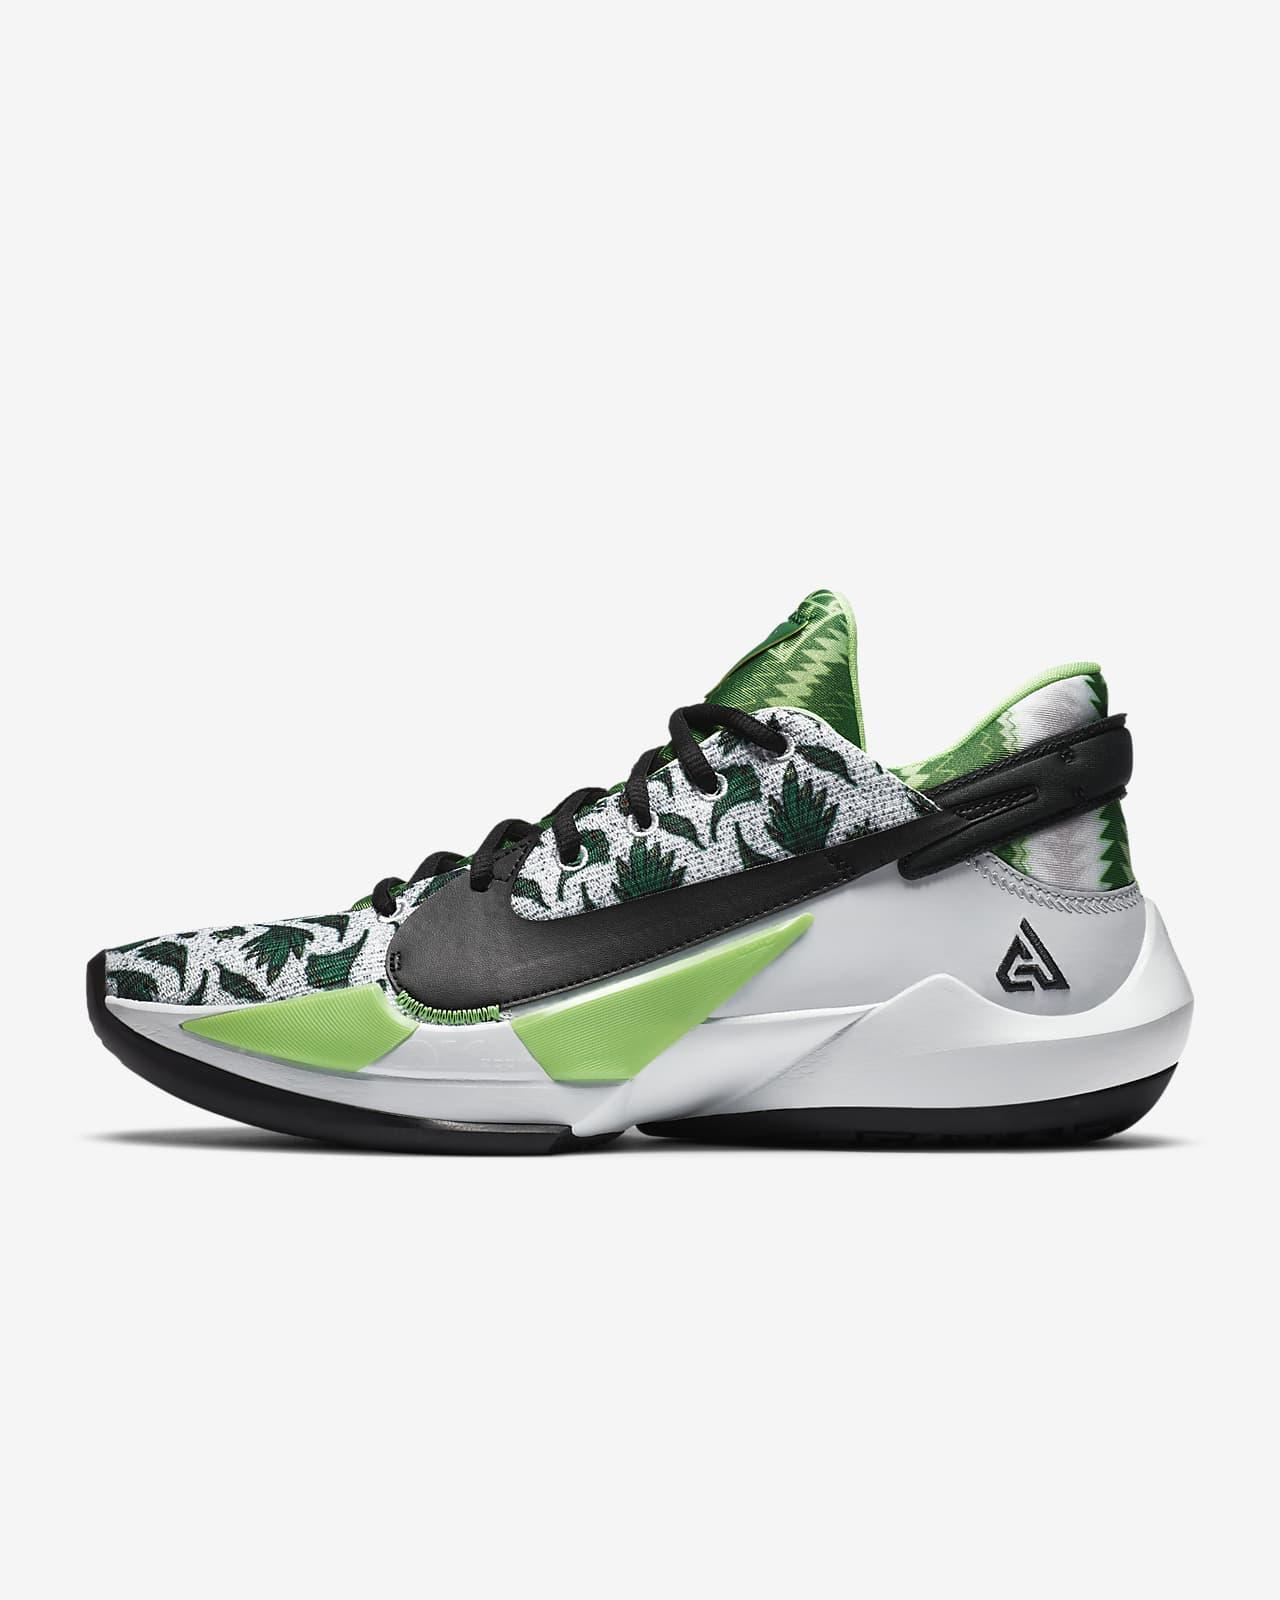 Chaussure de basketball Zoom Freak 2 Naija